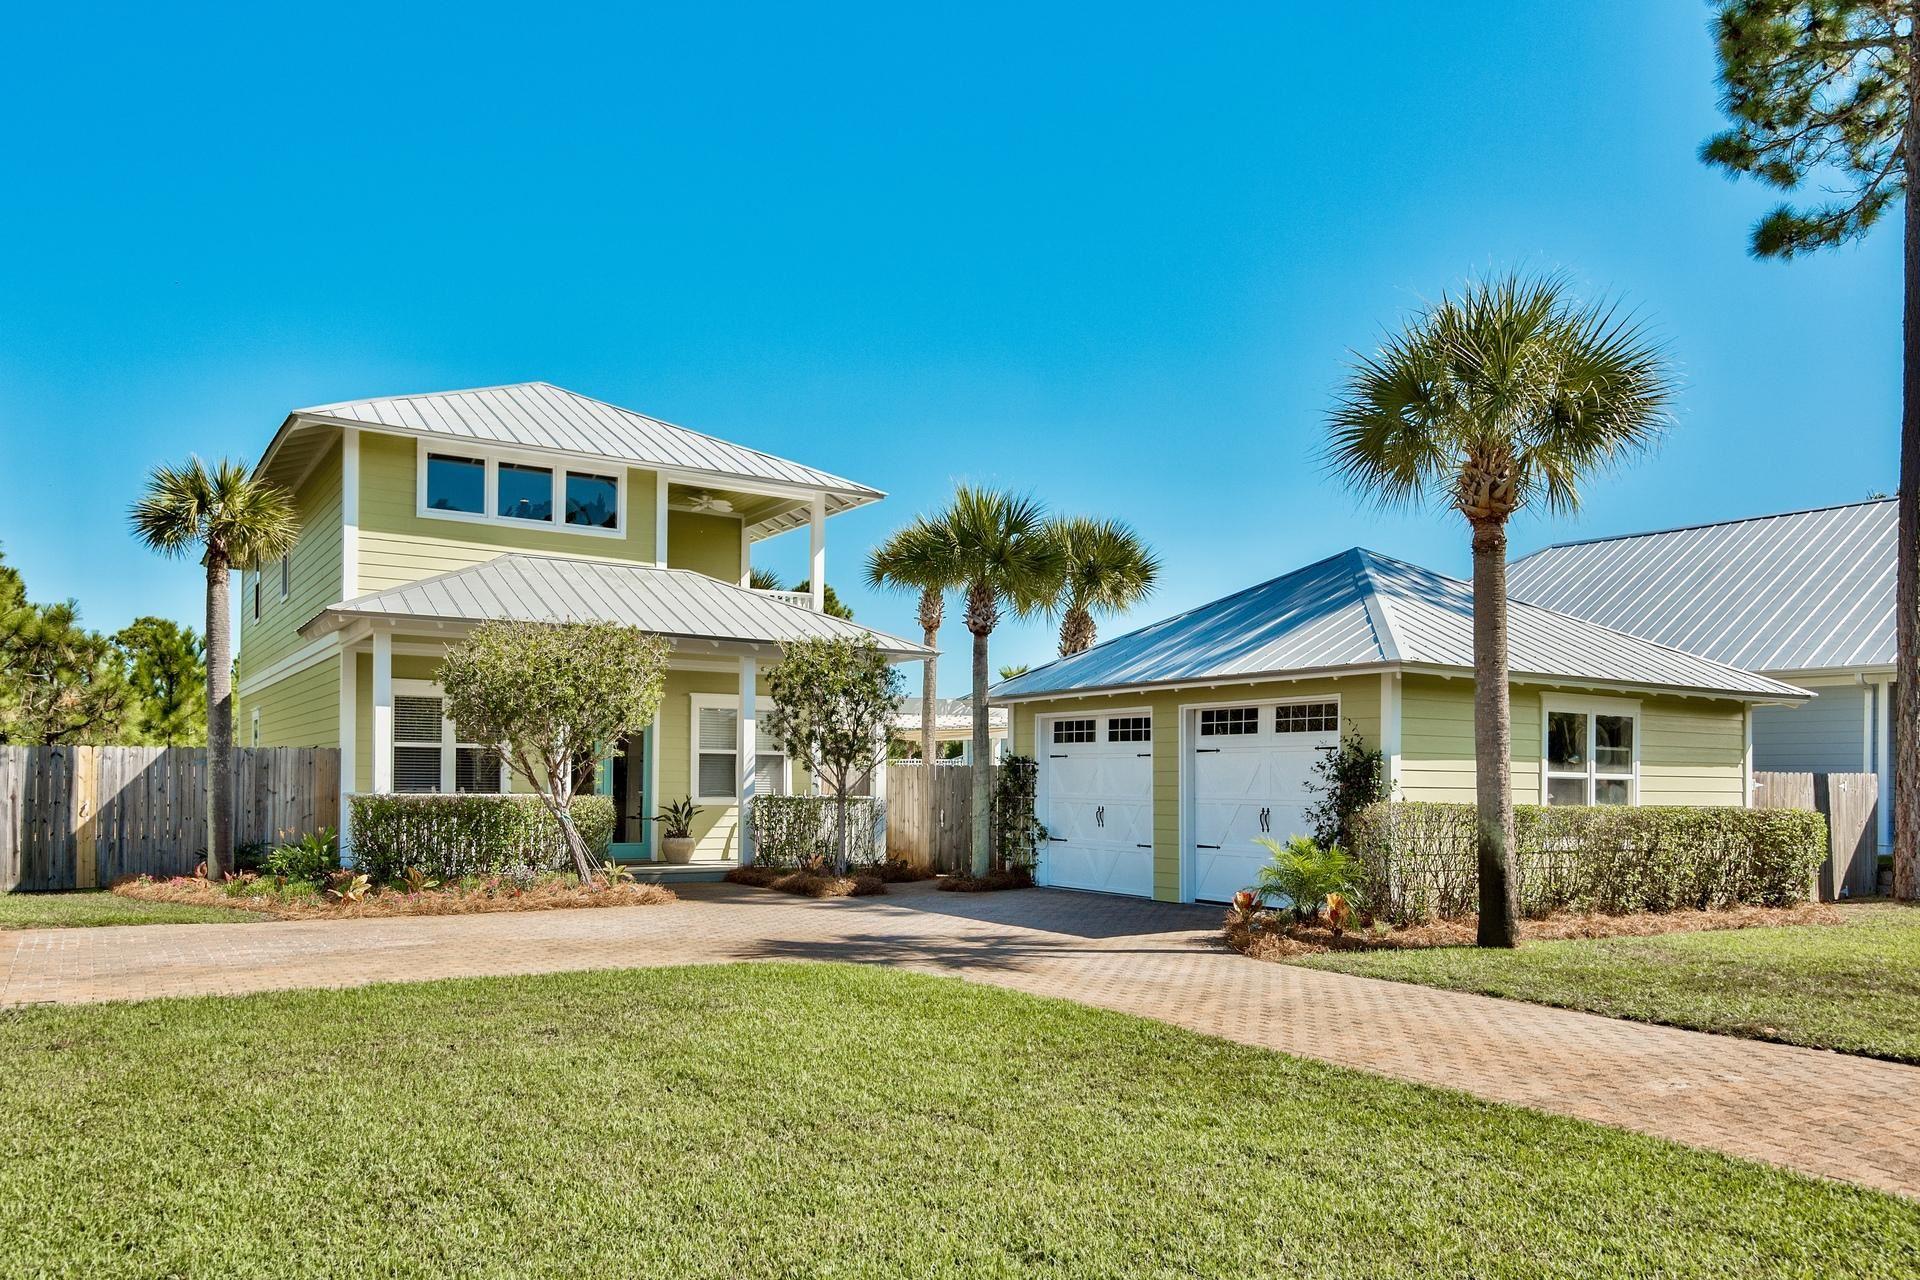 Photo for 30 N Cypress Breeze Boulevard, Santa Rosa Beach, FL 32459 (MLS # 820435)